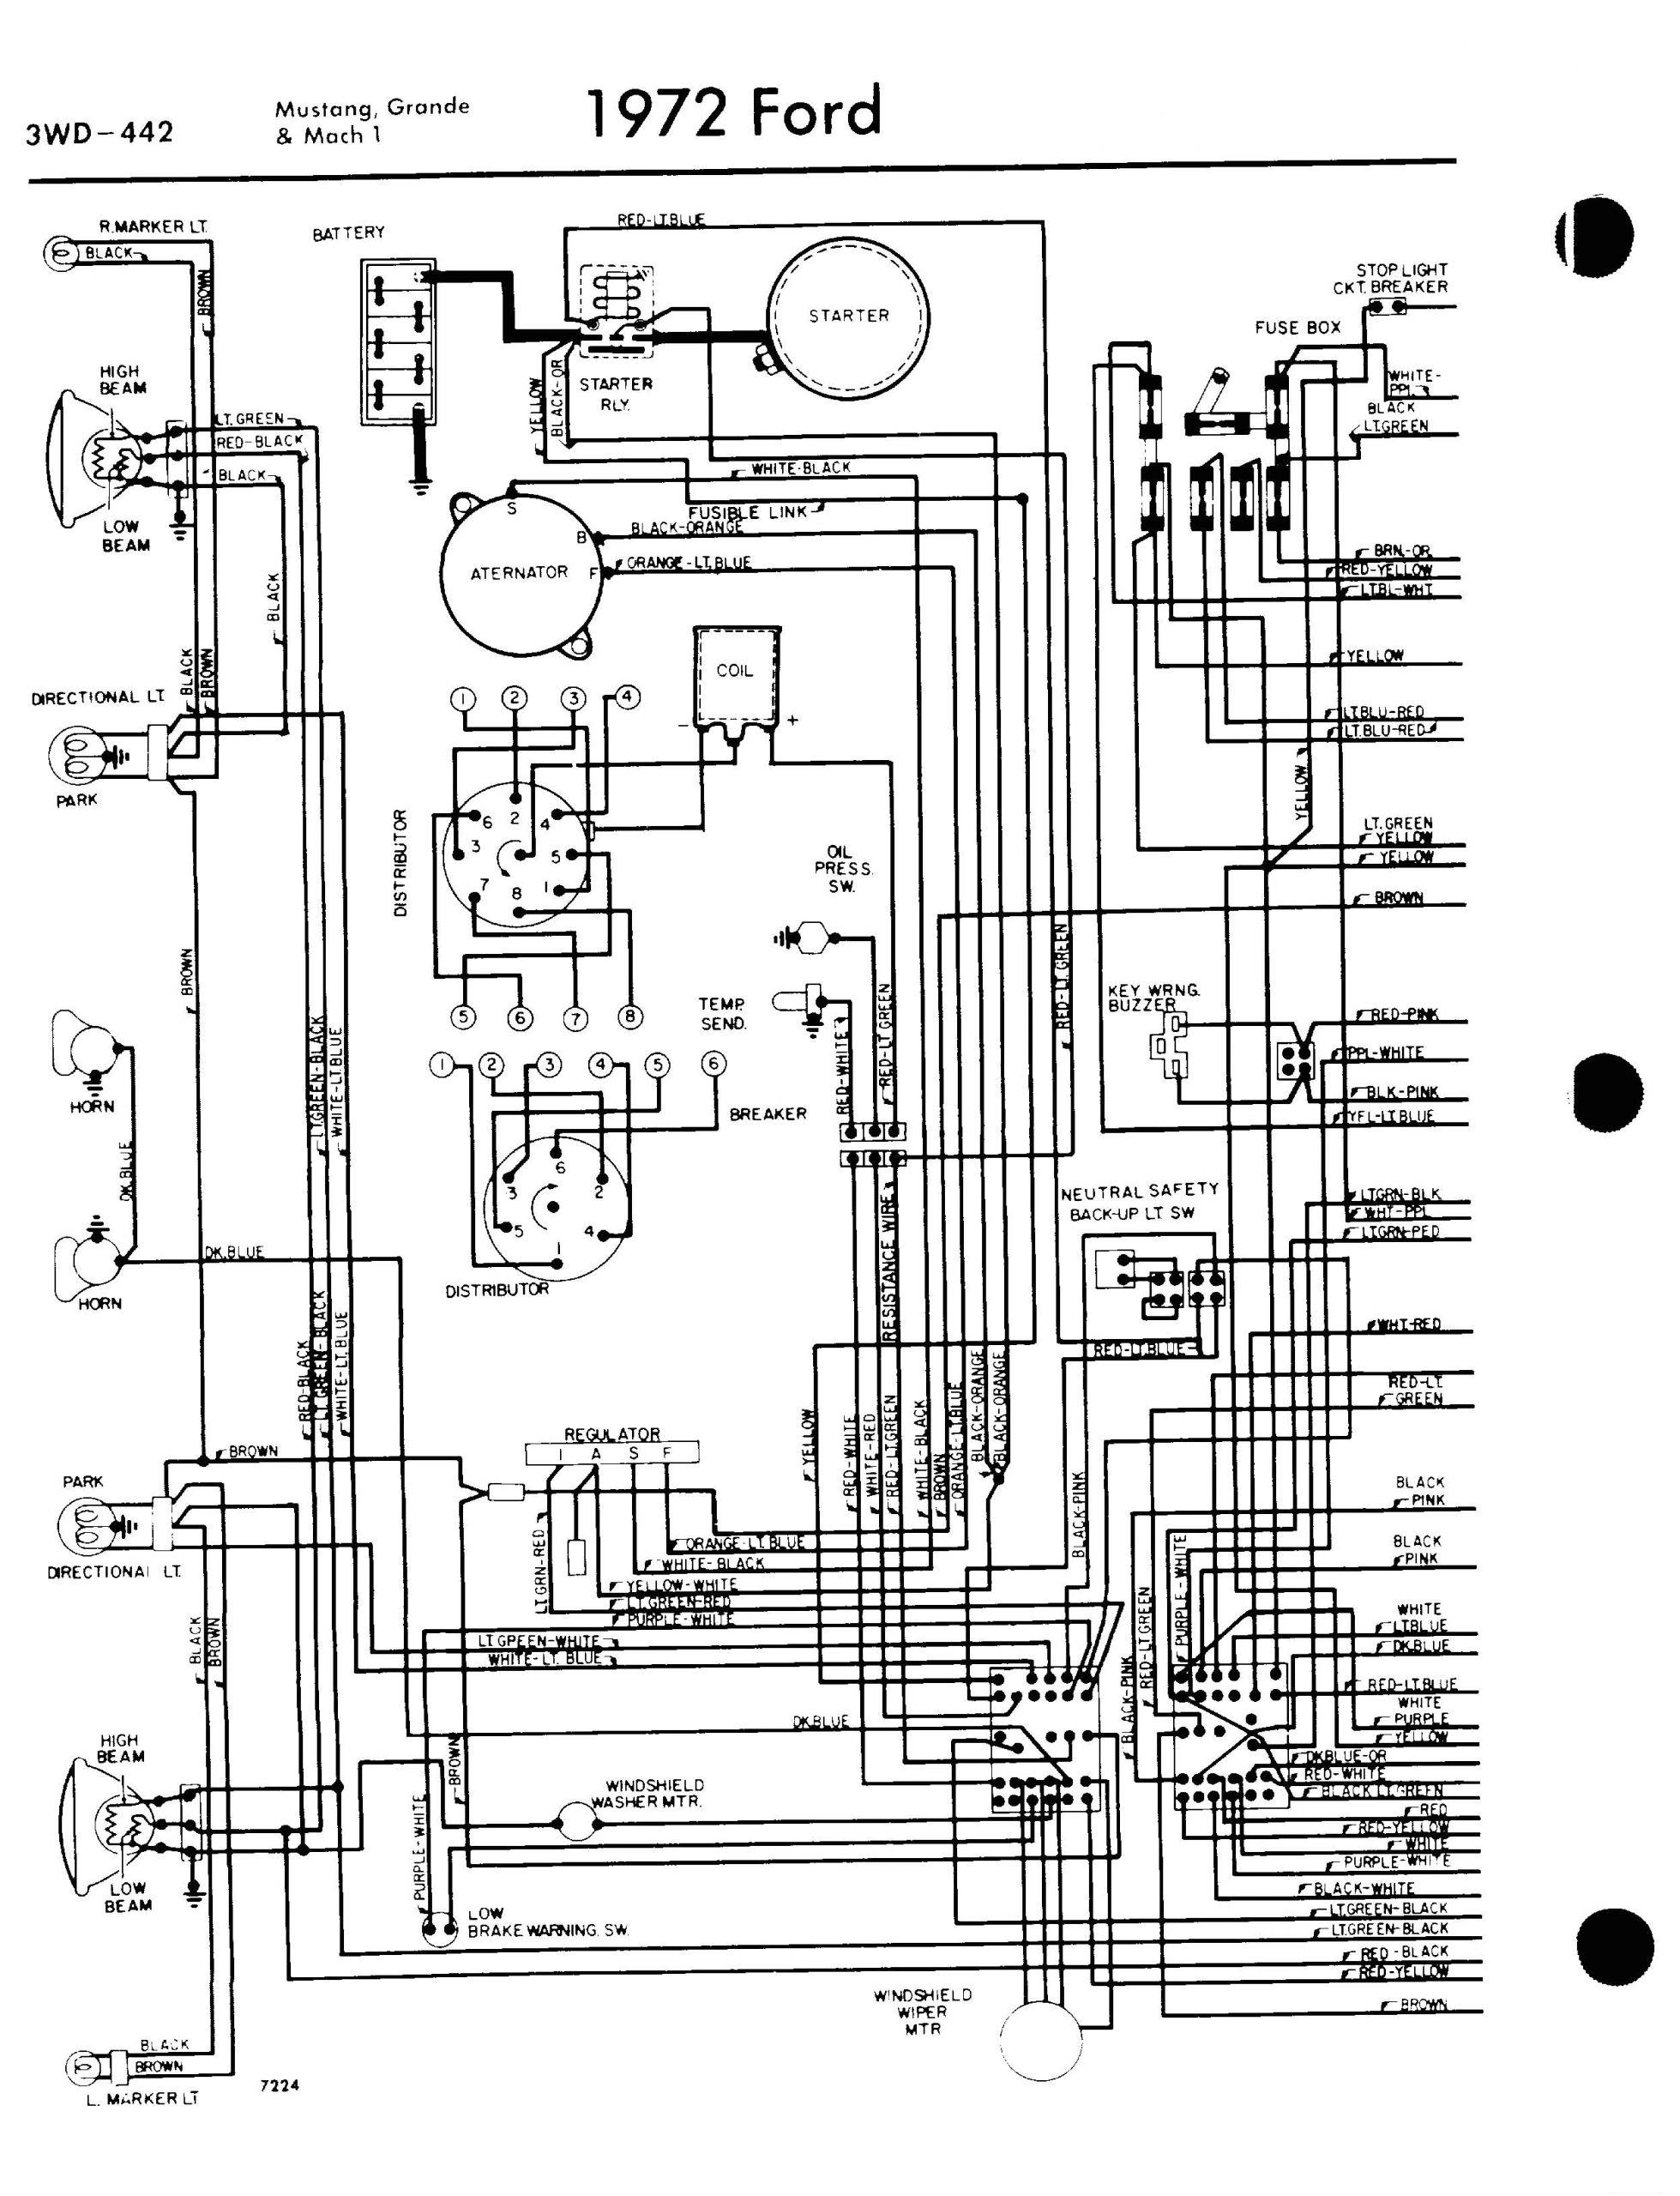 2005 Polaris Ranger Wiring Diagram 2005 ford Ranger 4 0 Fuse Box Diagram Wiring Library